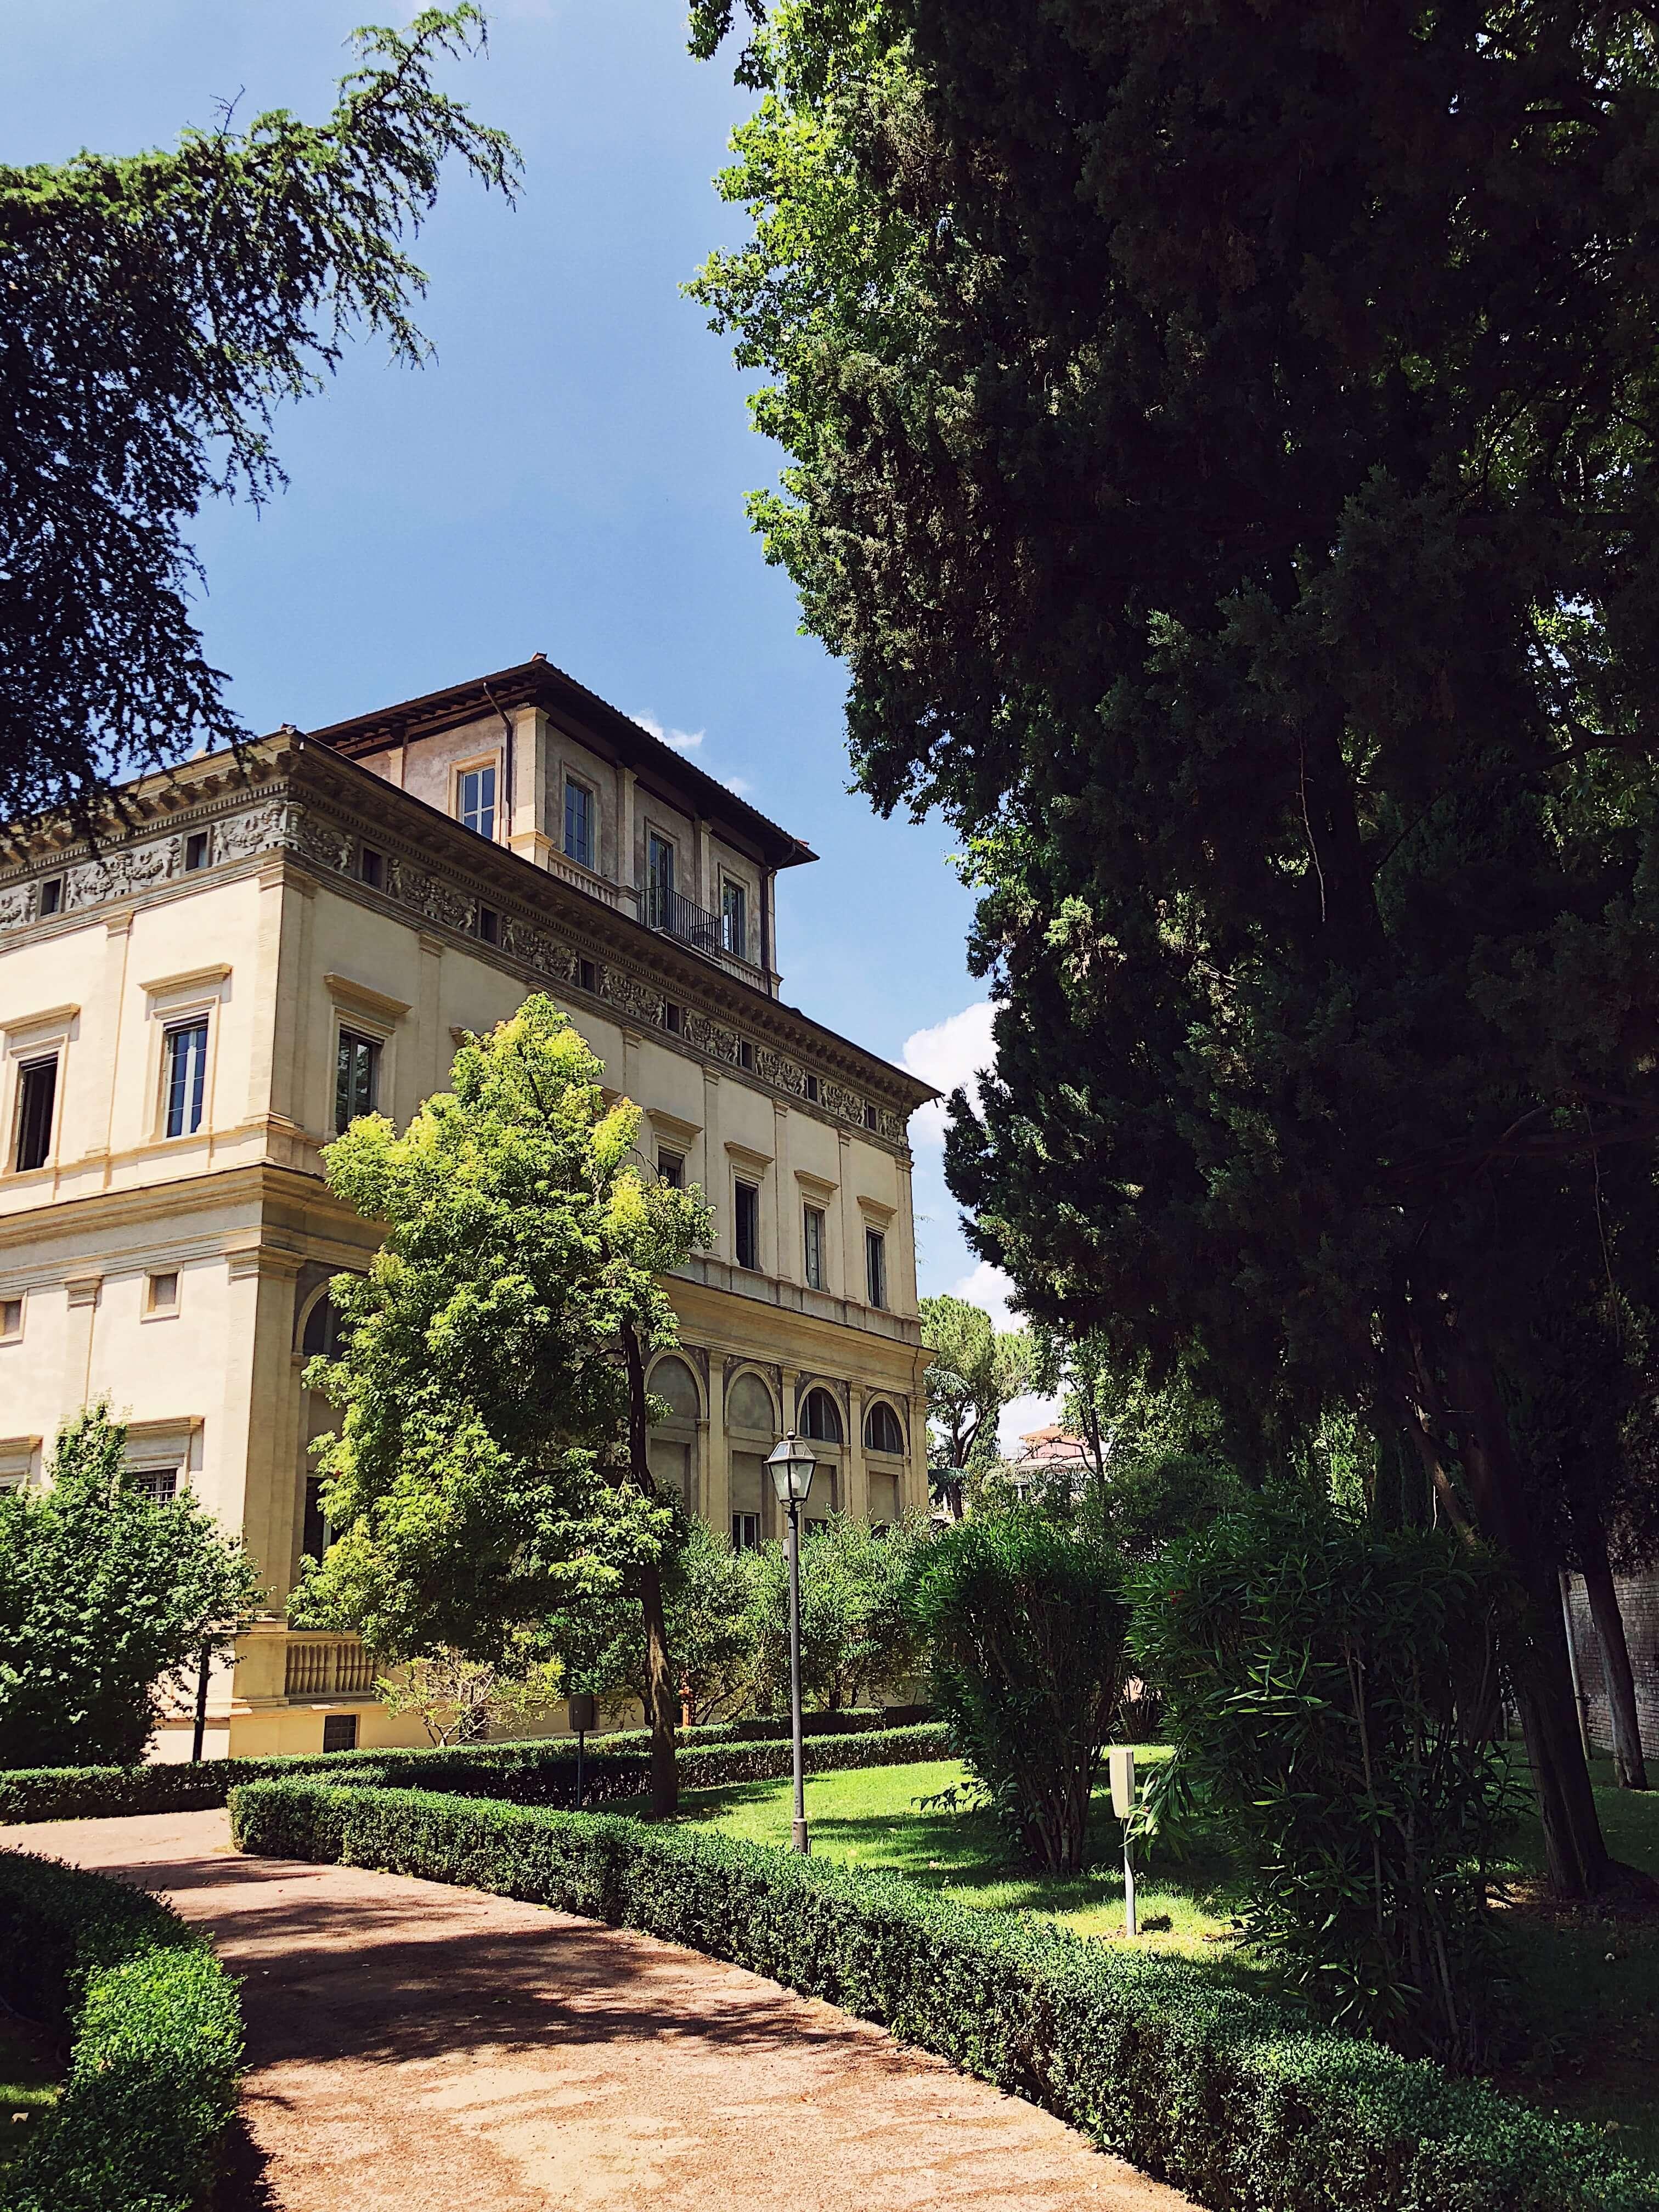 Italian cuisine magazine: villa farnesina in Rome #thegourmetmag #italy